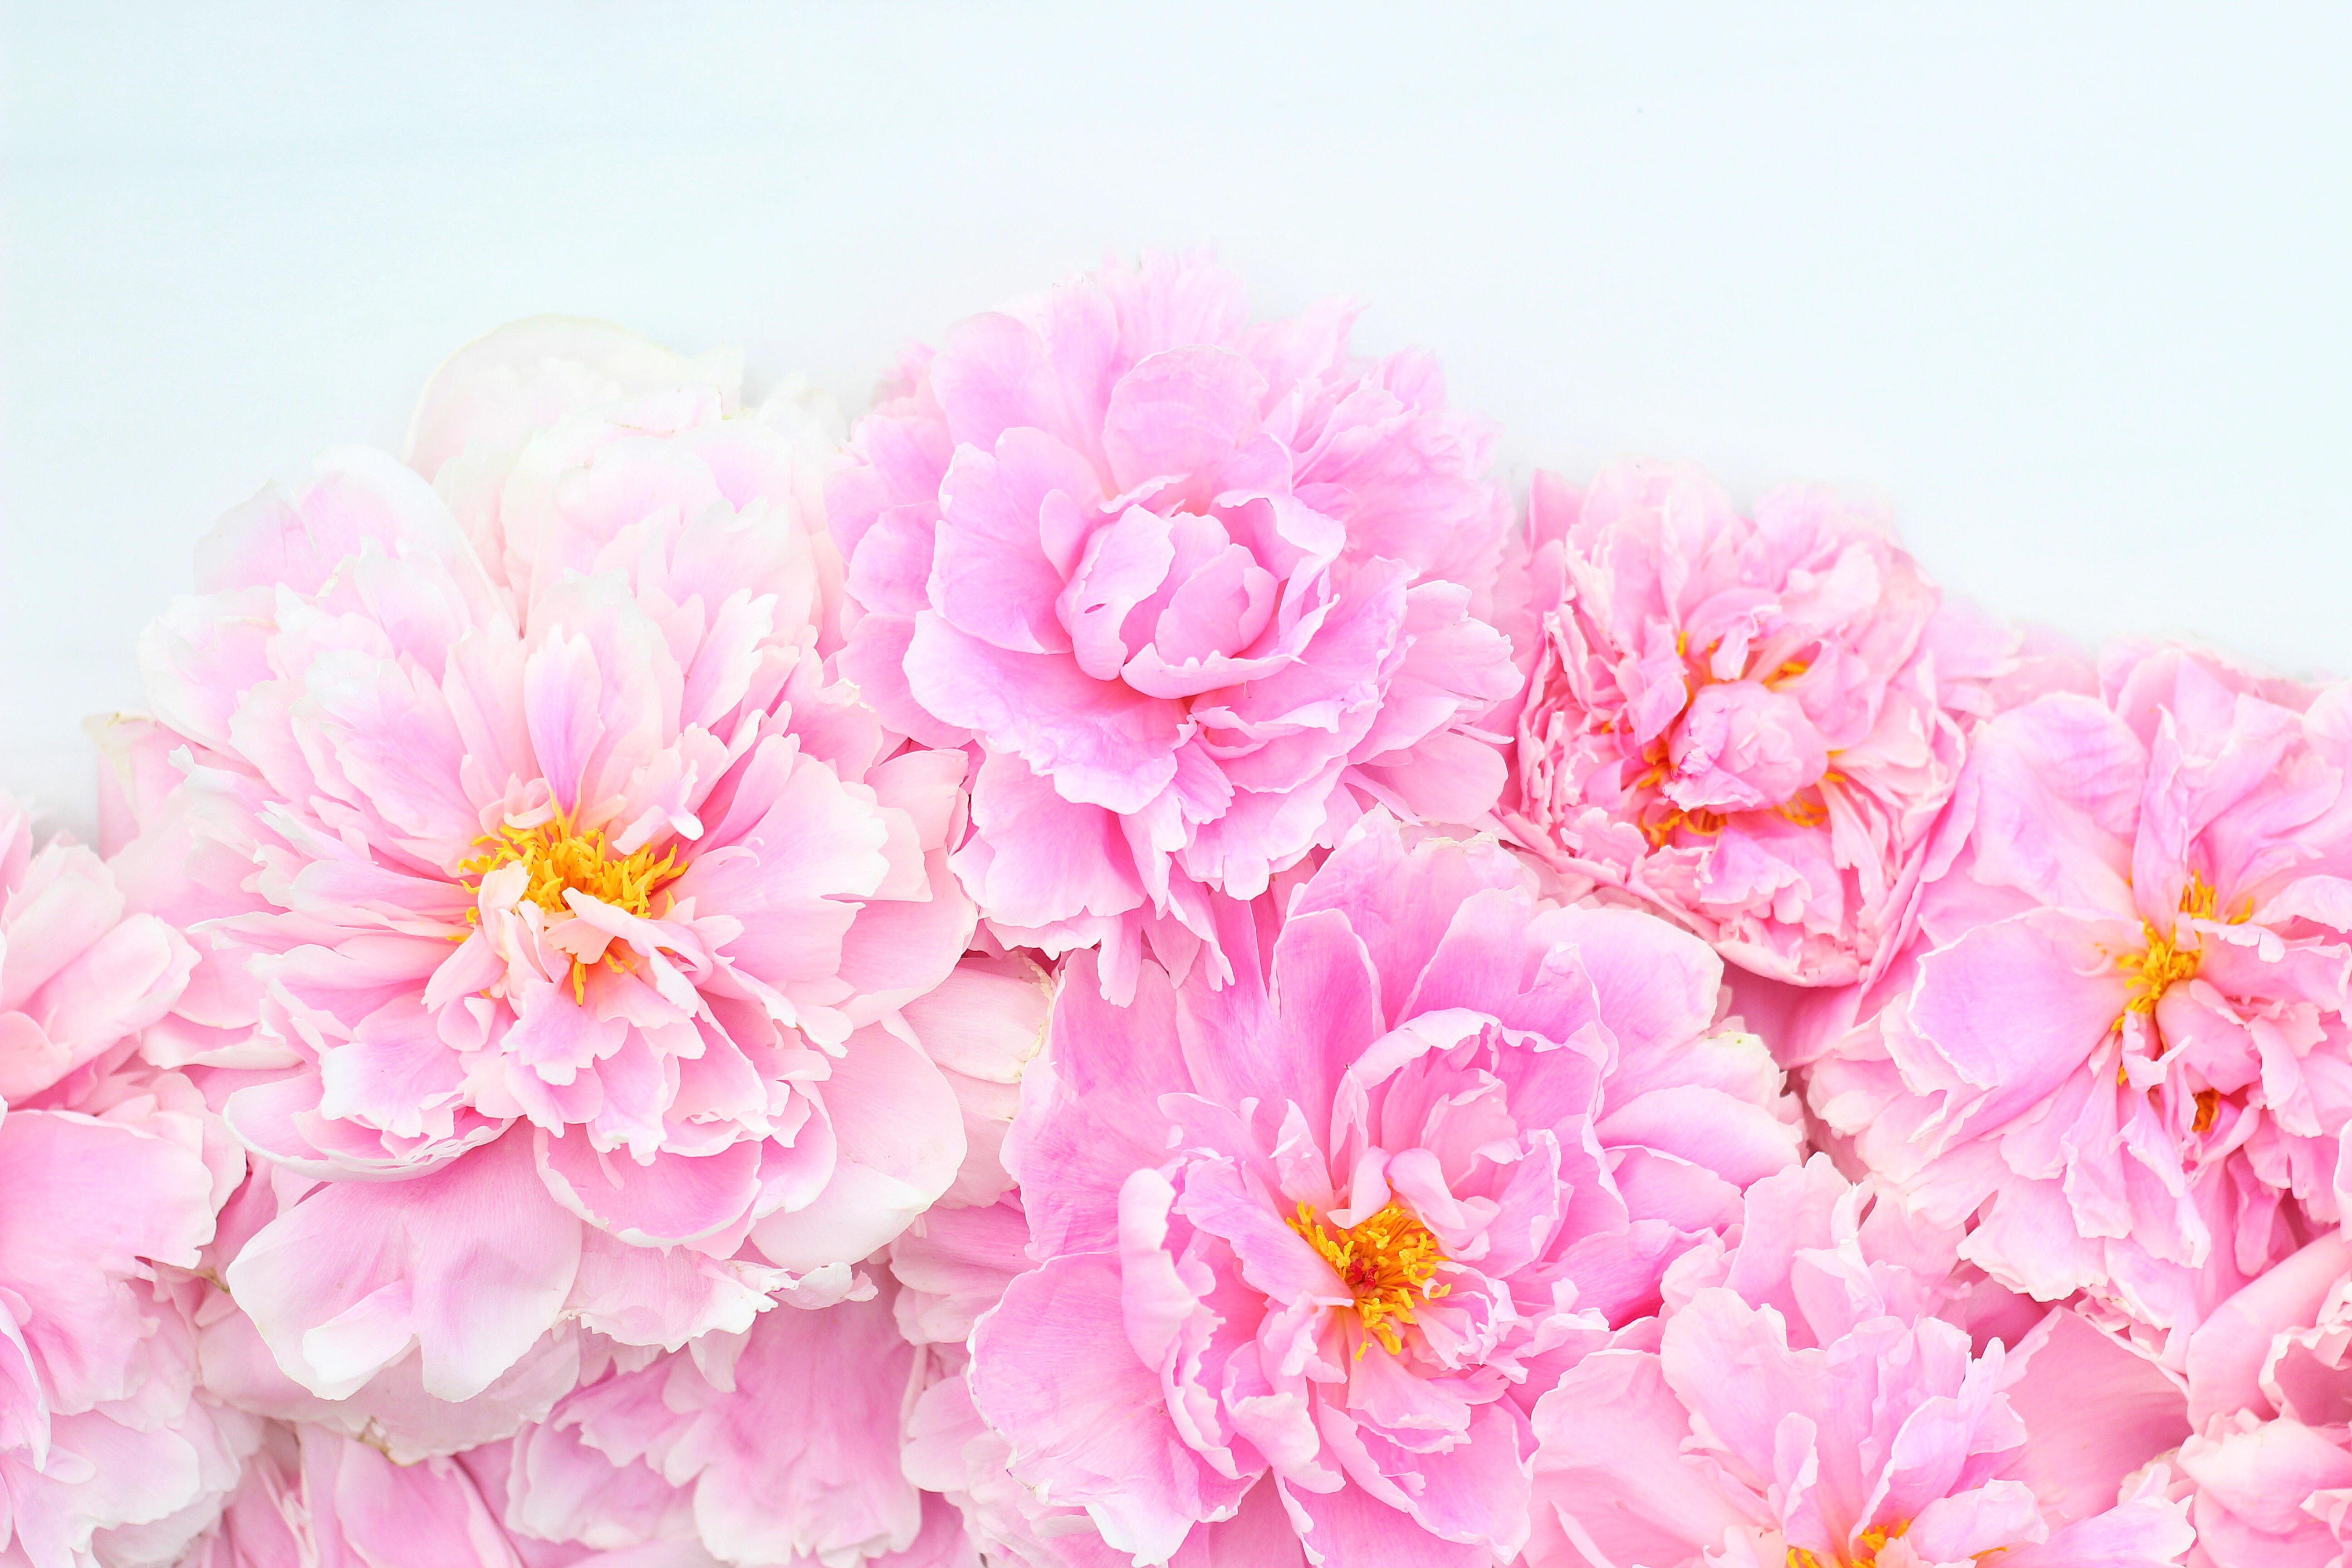 Digital Blooms Desktop Wallpaper 2 | July 2016 // JustineCelina.com x Rebecca Dawn Design